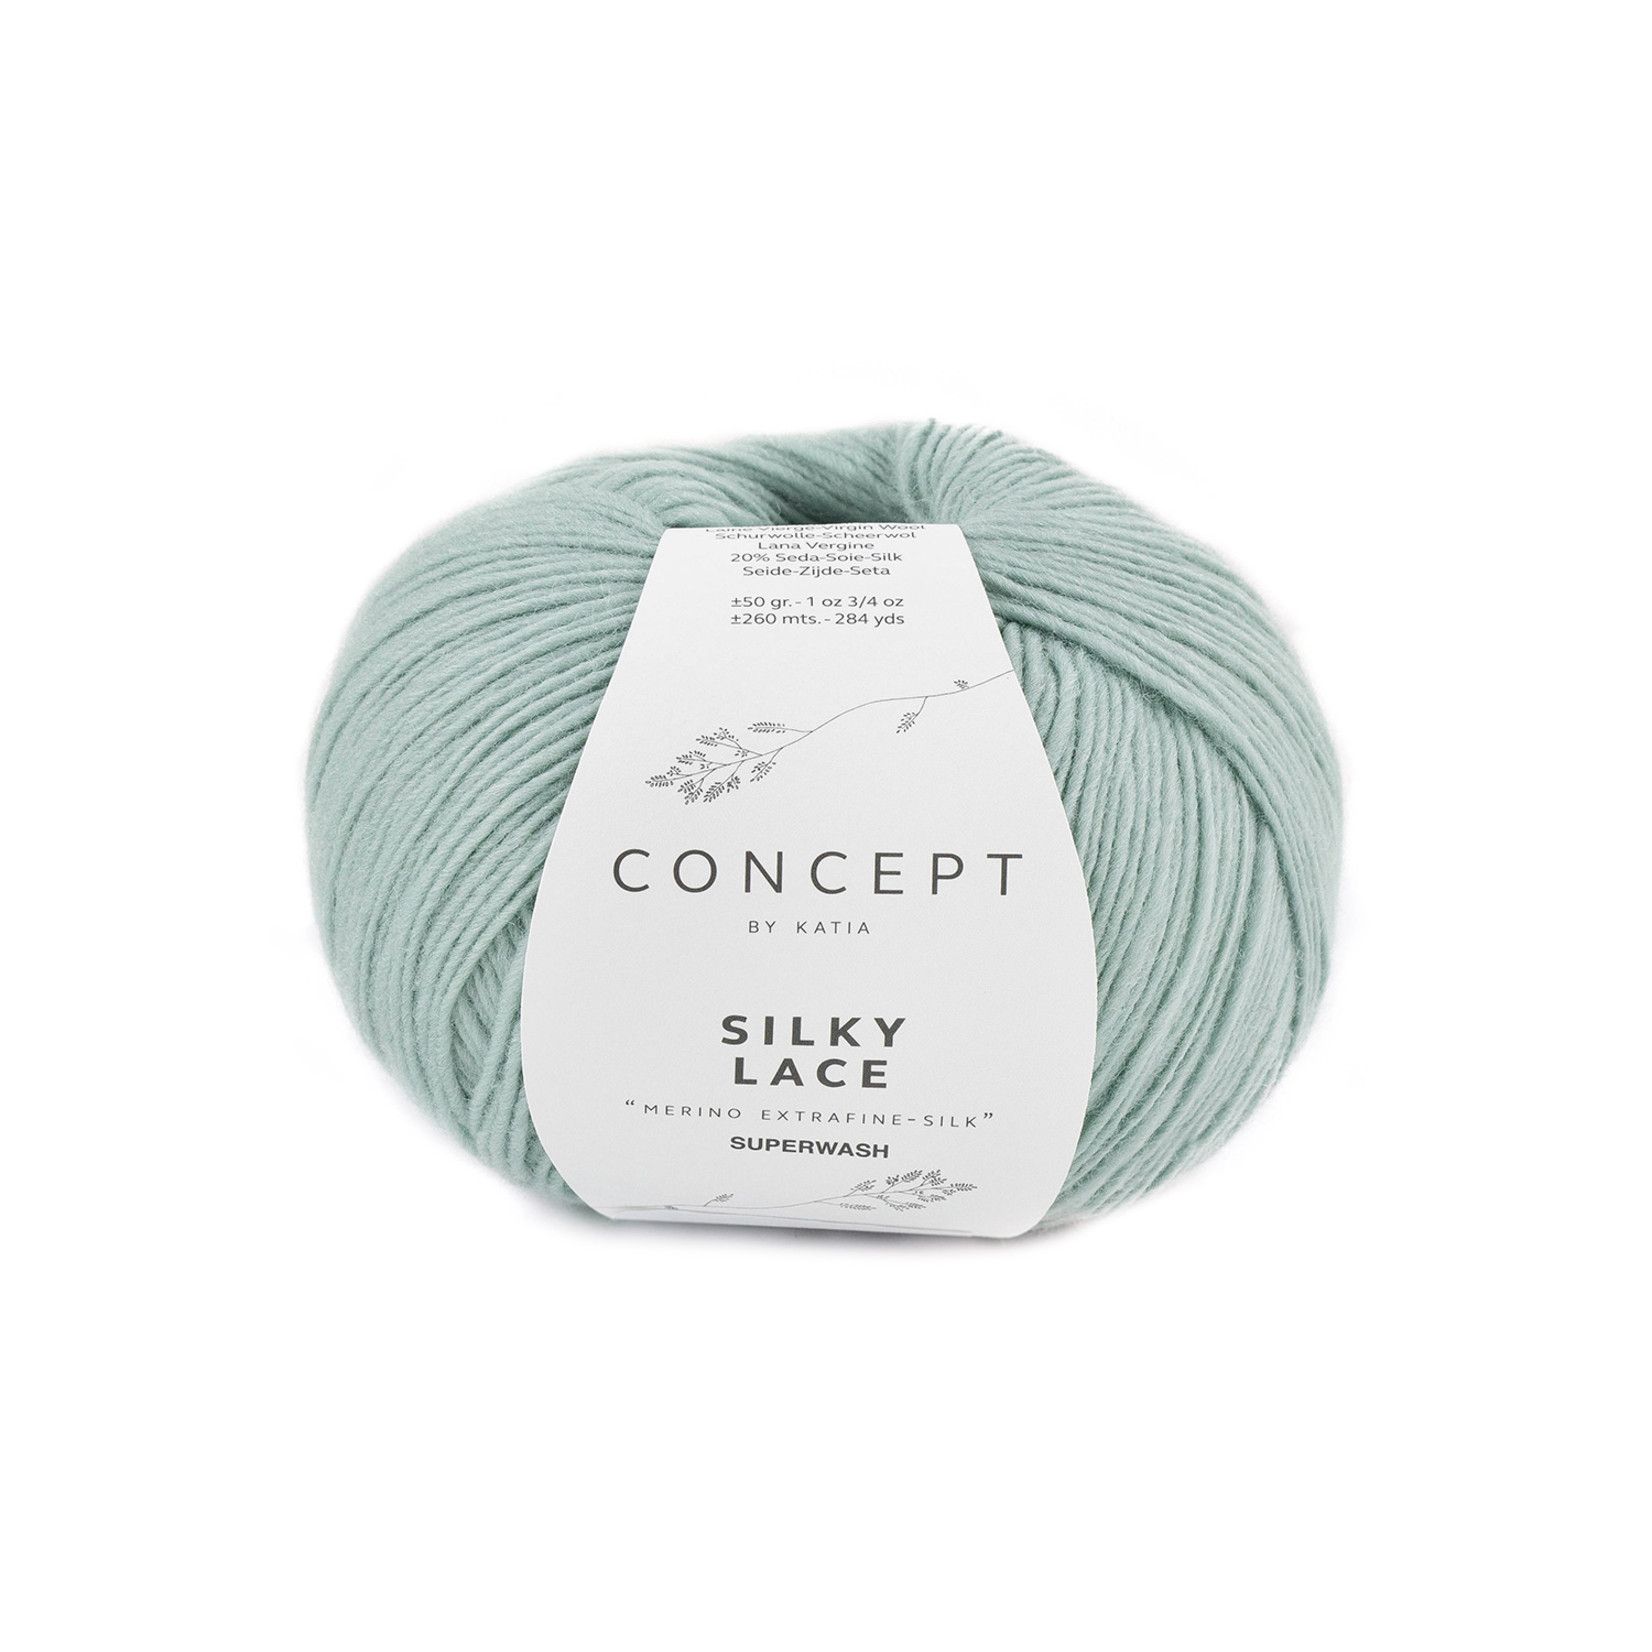 Katia Katia - Silky Lace - kleur 177 - Witgroen - 50 gr. = 260 m.